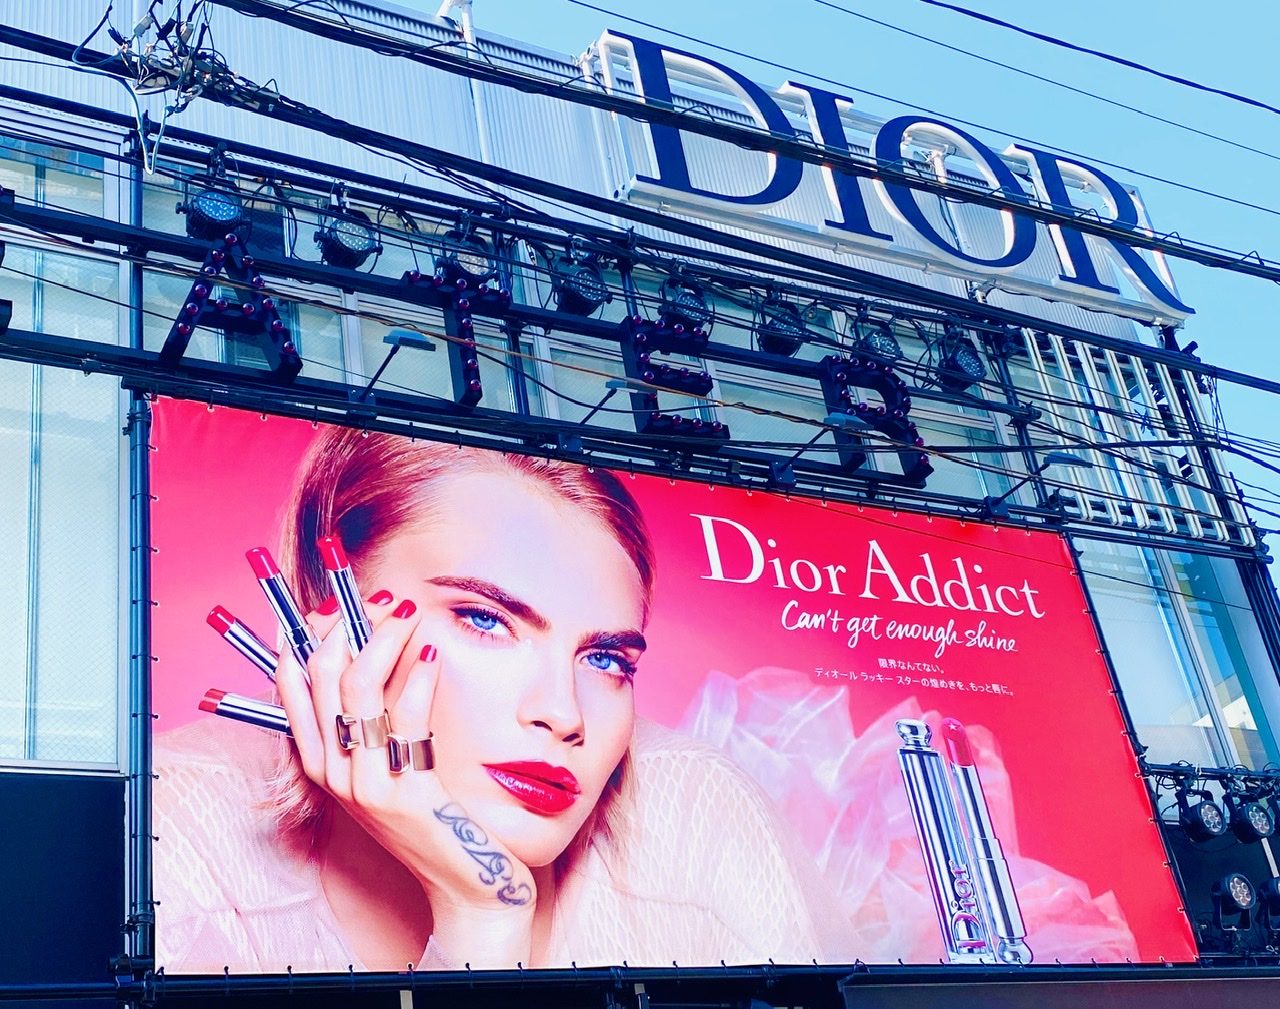 【Dior】豪華お土産付★新作リップをひと足早くお試し!連日大盛況のポップアップイベントへ♡_1